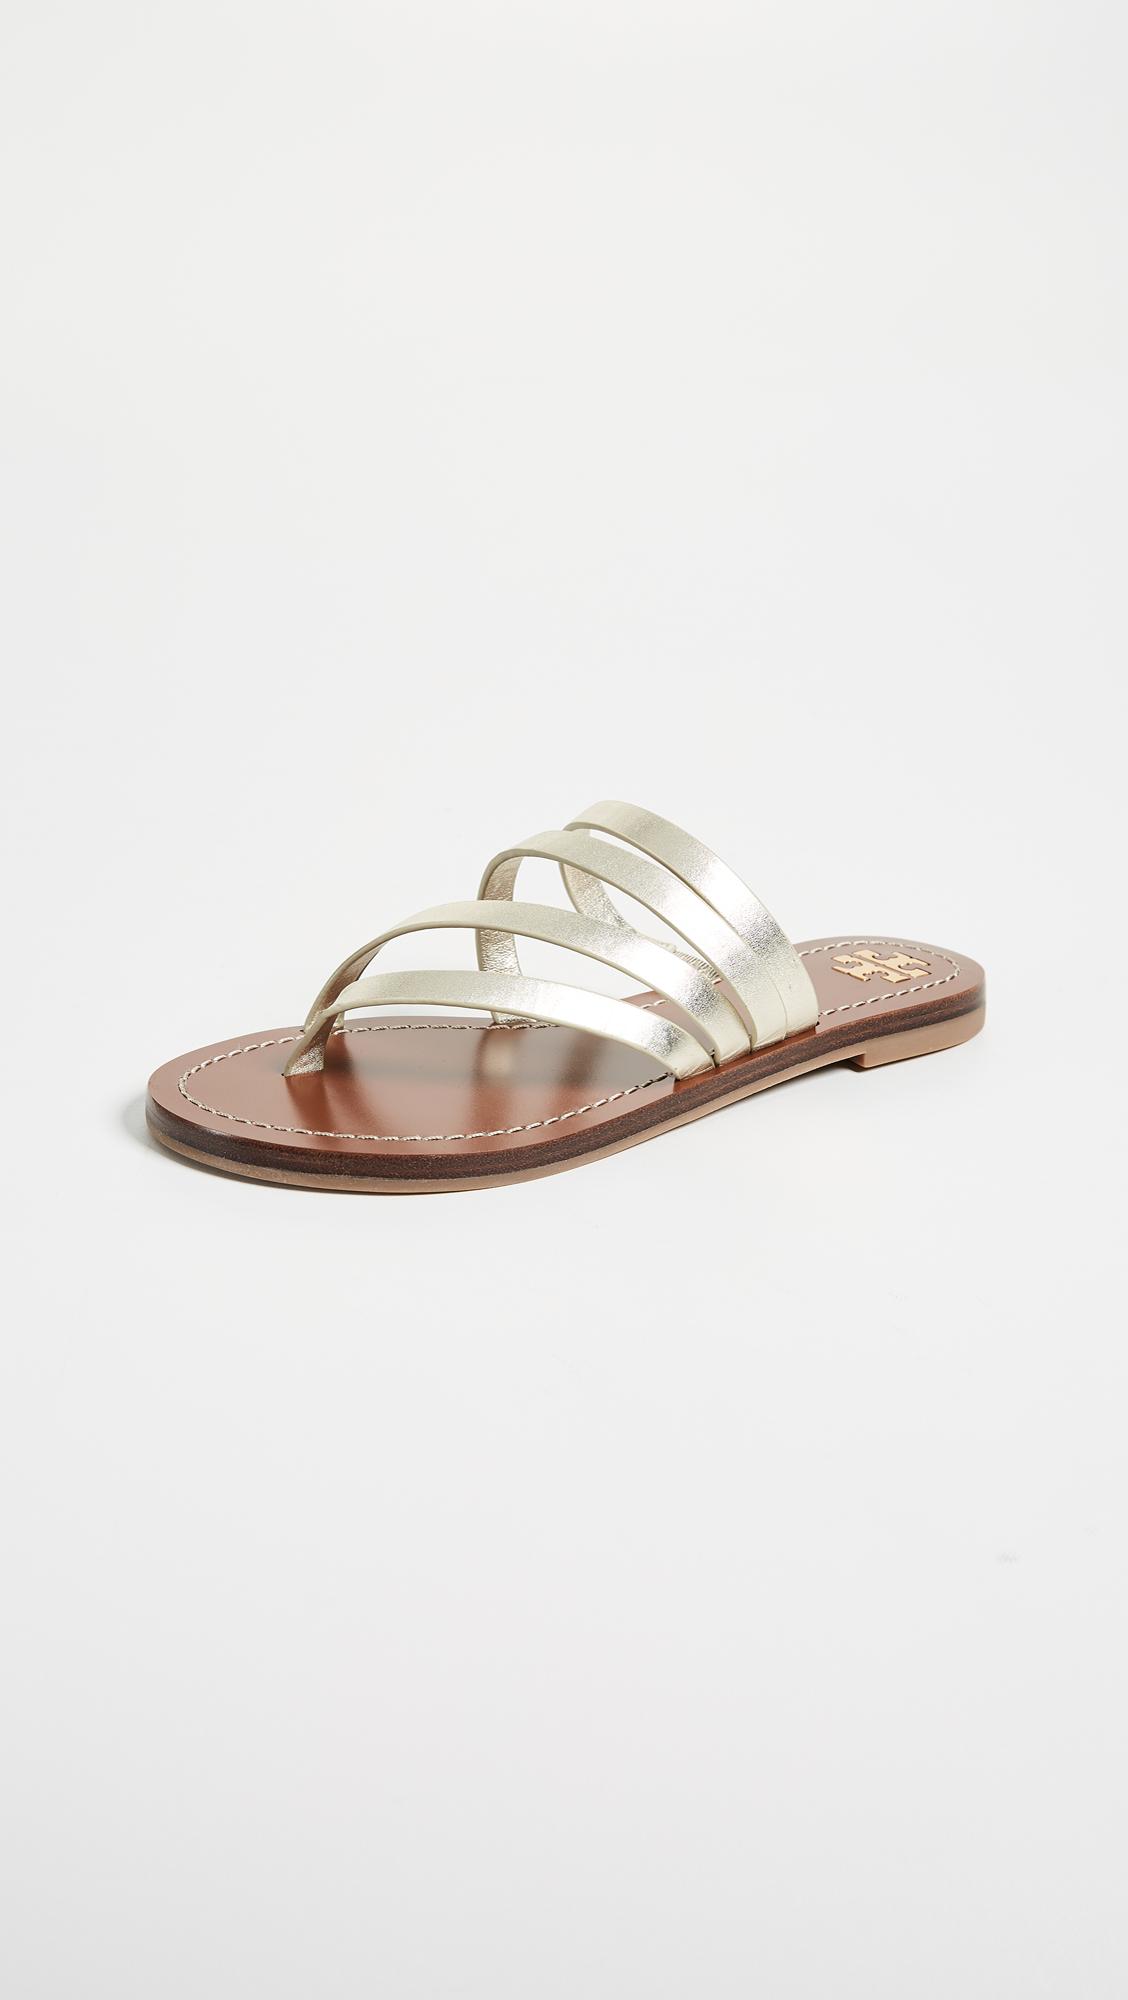 Tory Burch. Patos Flat Sandals